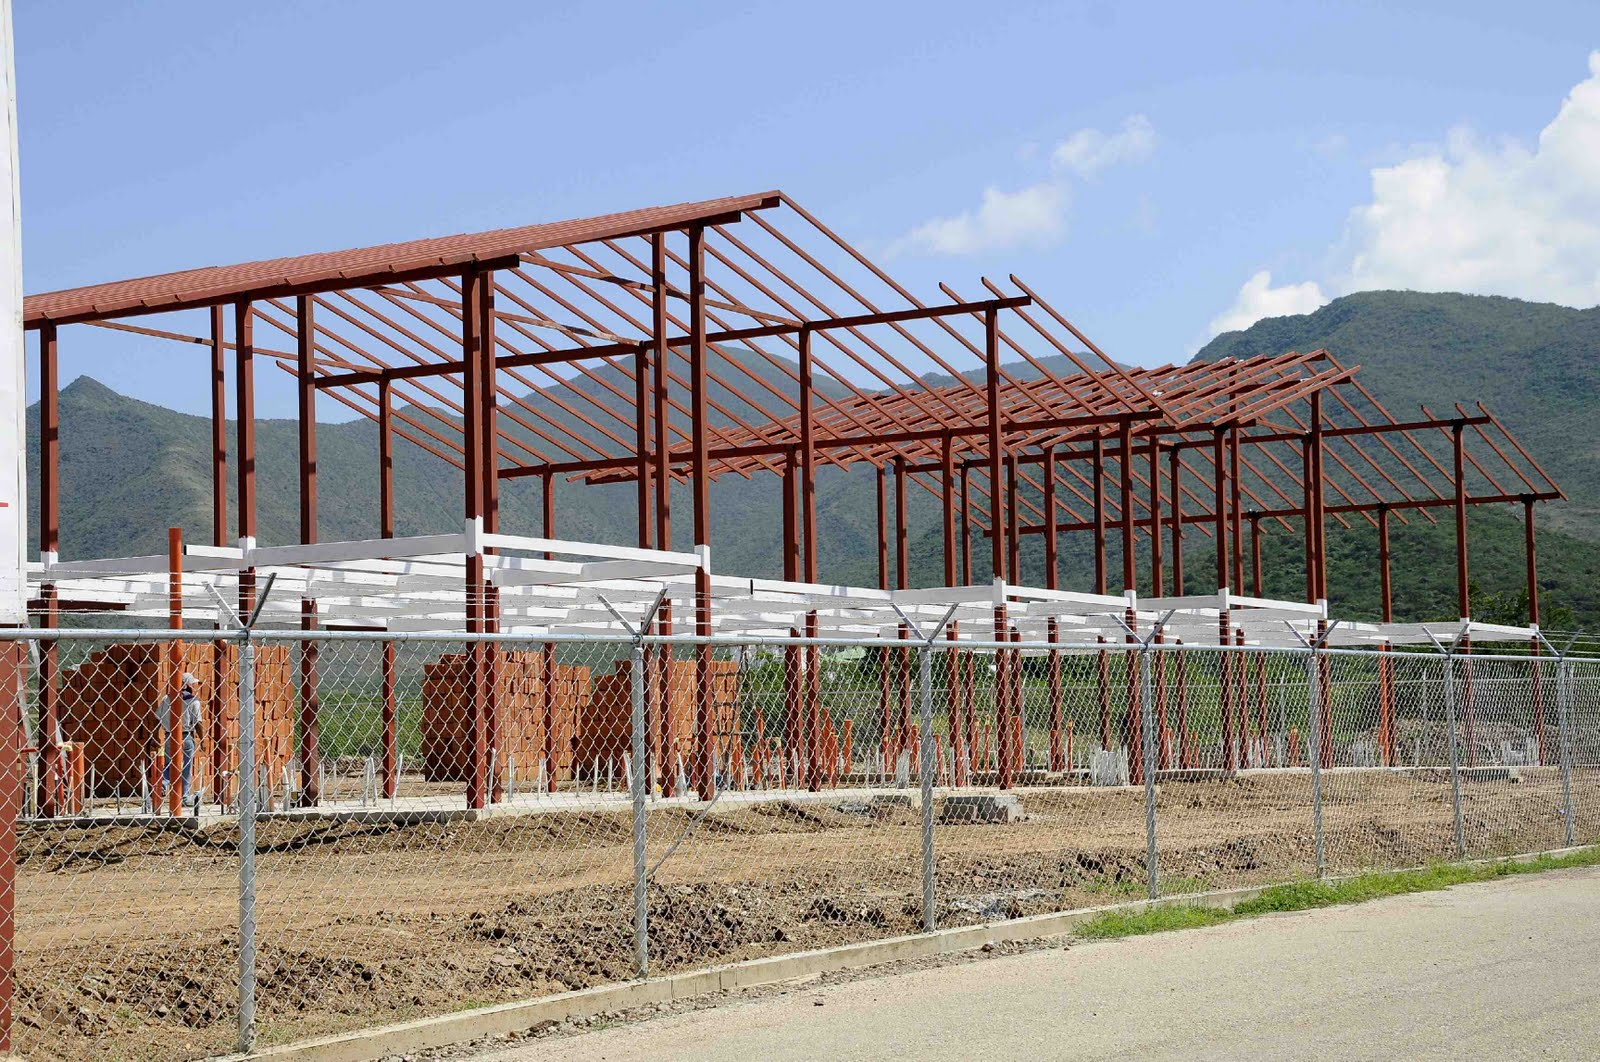 Sol de margarita 872 casas construir poder popular de - Estructuras metalicas para viviendas ...